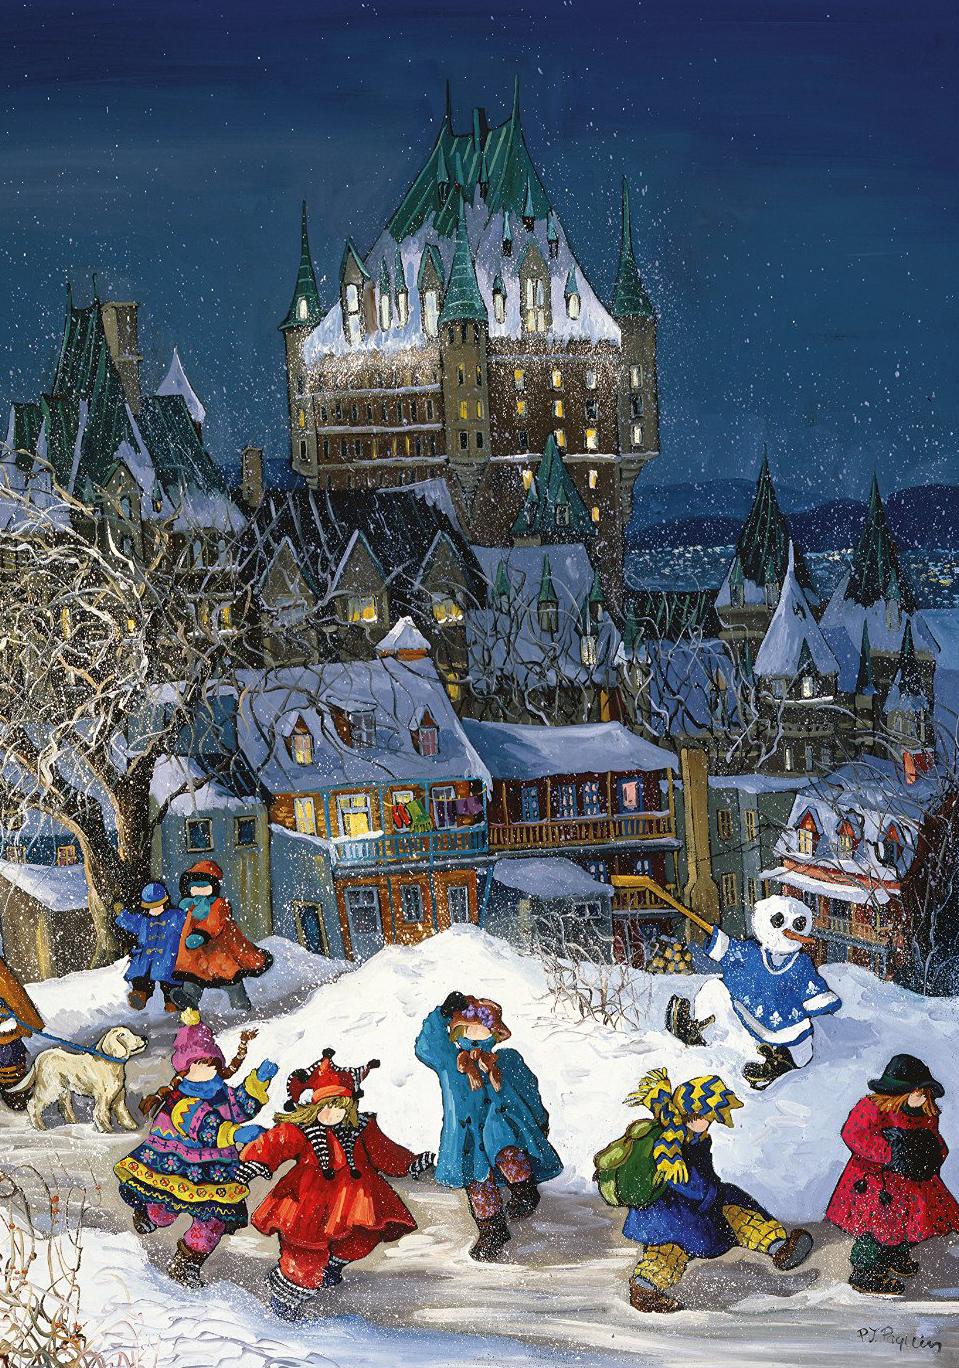 Trefl Jigsaw Puzzle 1000 Pieces Pauline Paquin Frontenac Castle in Quebec Canada frontenac-castle-qc